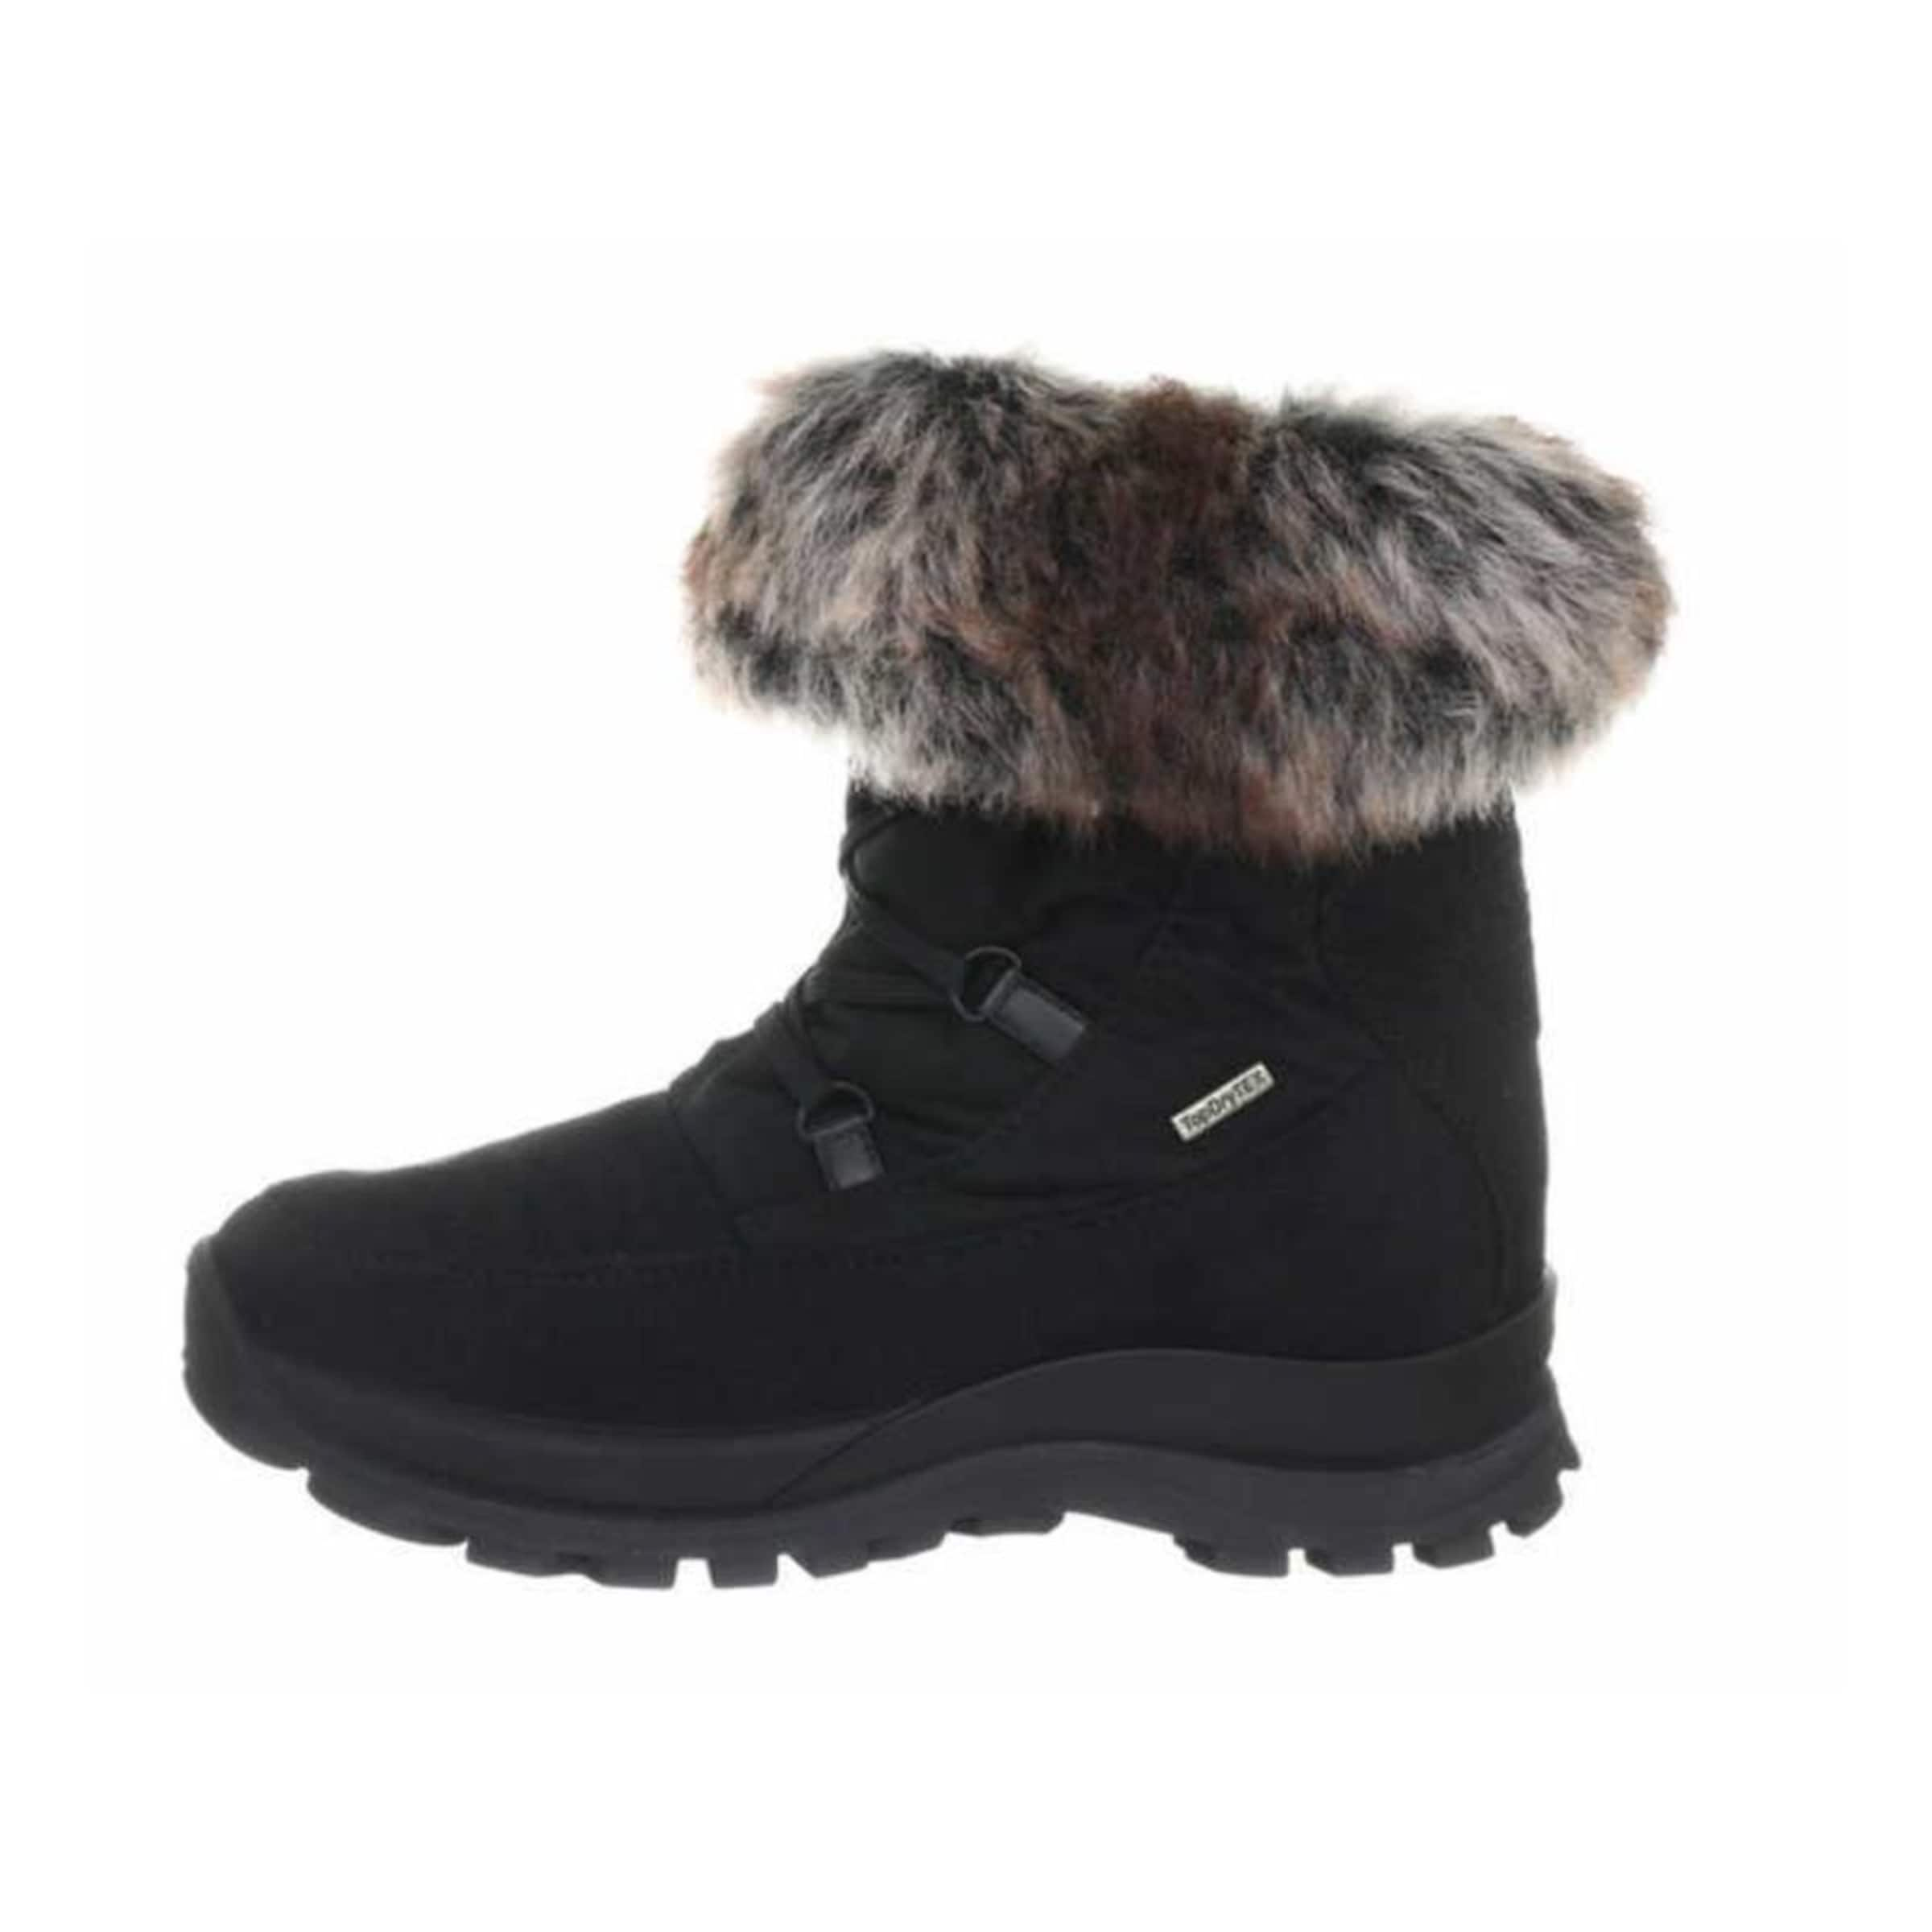 Stiefel Stiefel In In Romika Schwarz Romika 8kOX0NnwP